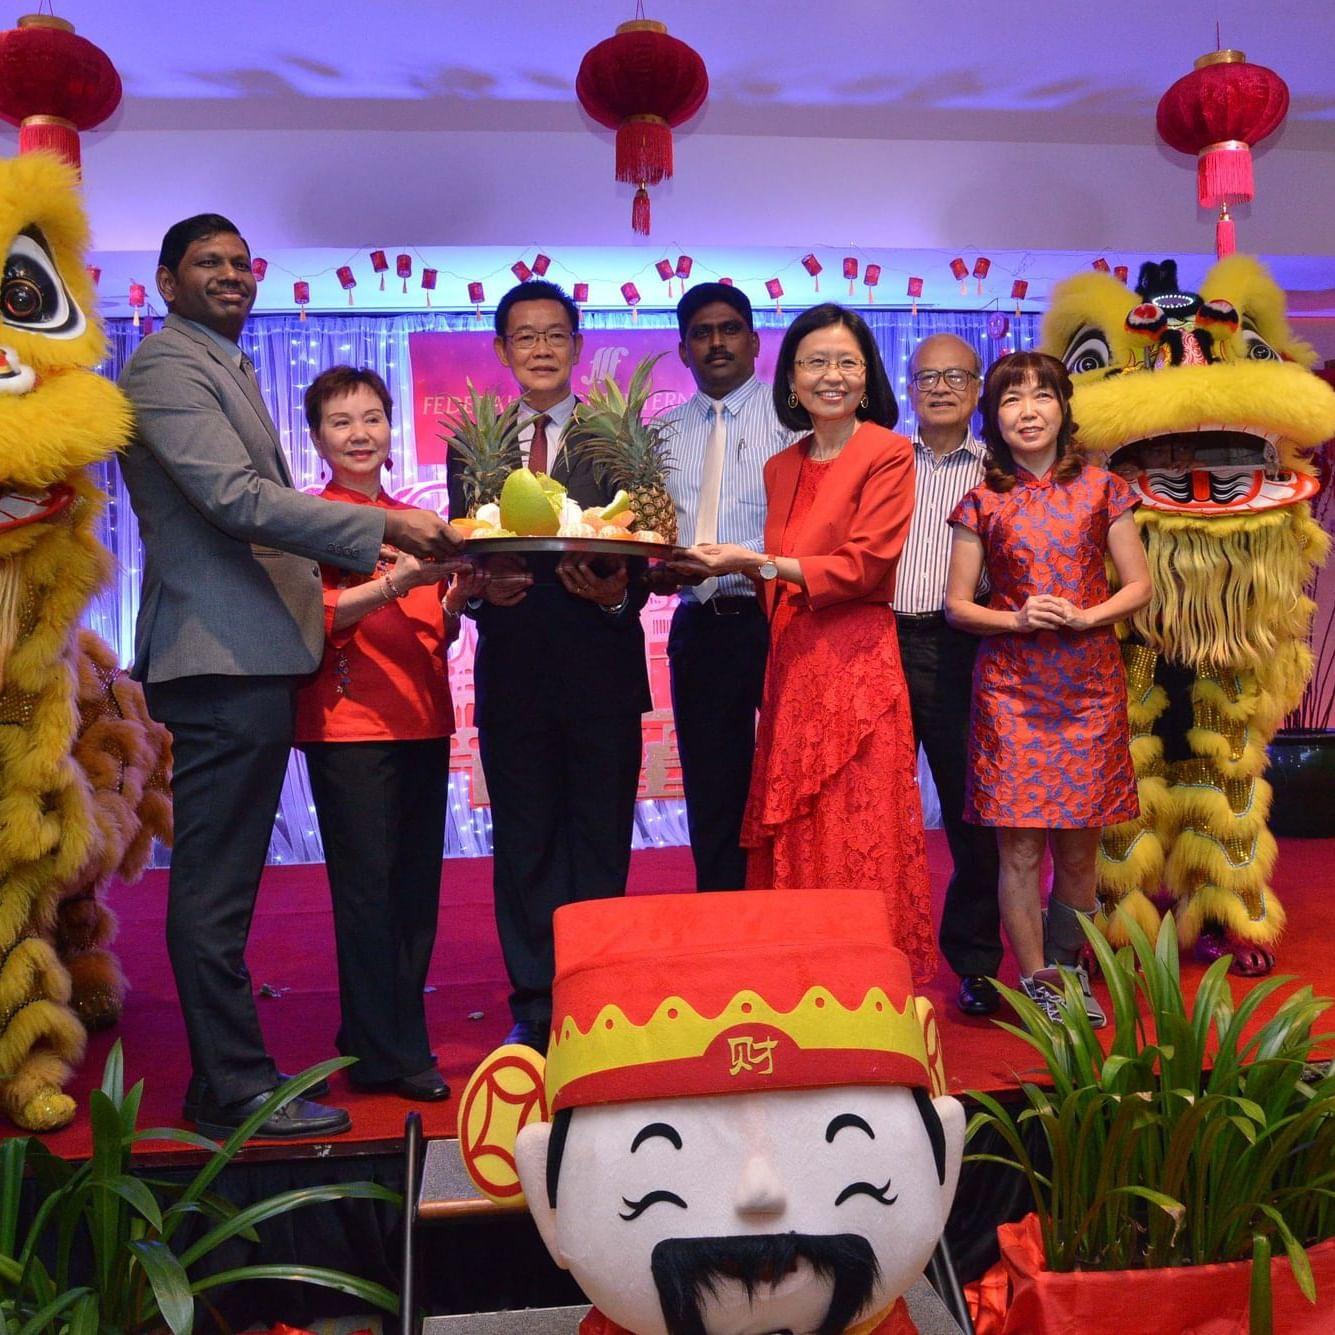 FEDERAL HOTELS INTERNATIONAL (FHI) GROUP GONG XI FA CAI FESTIVE CHARITY TREAT